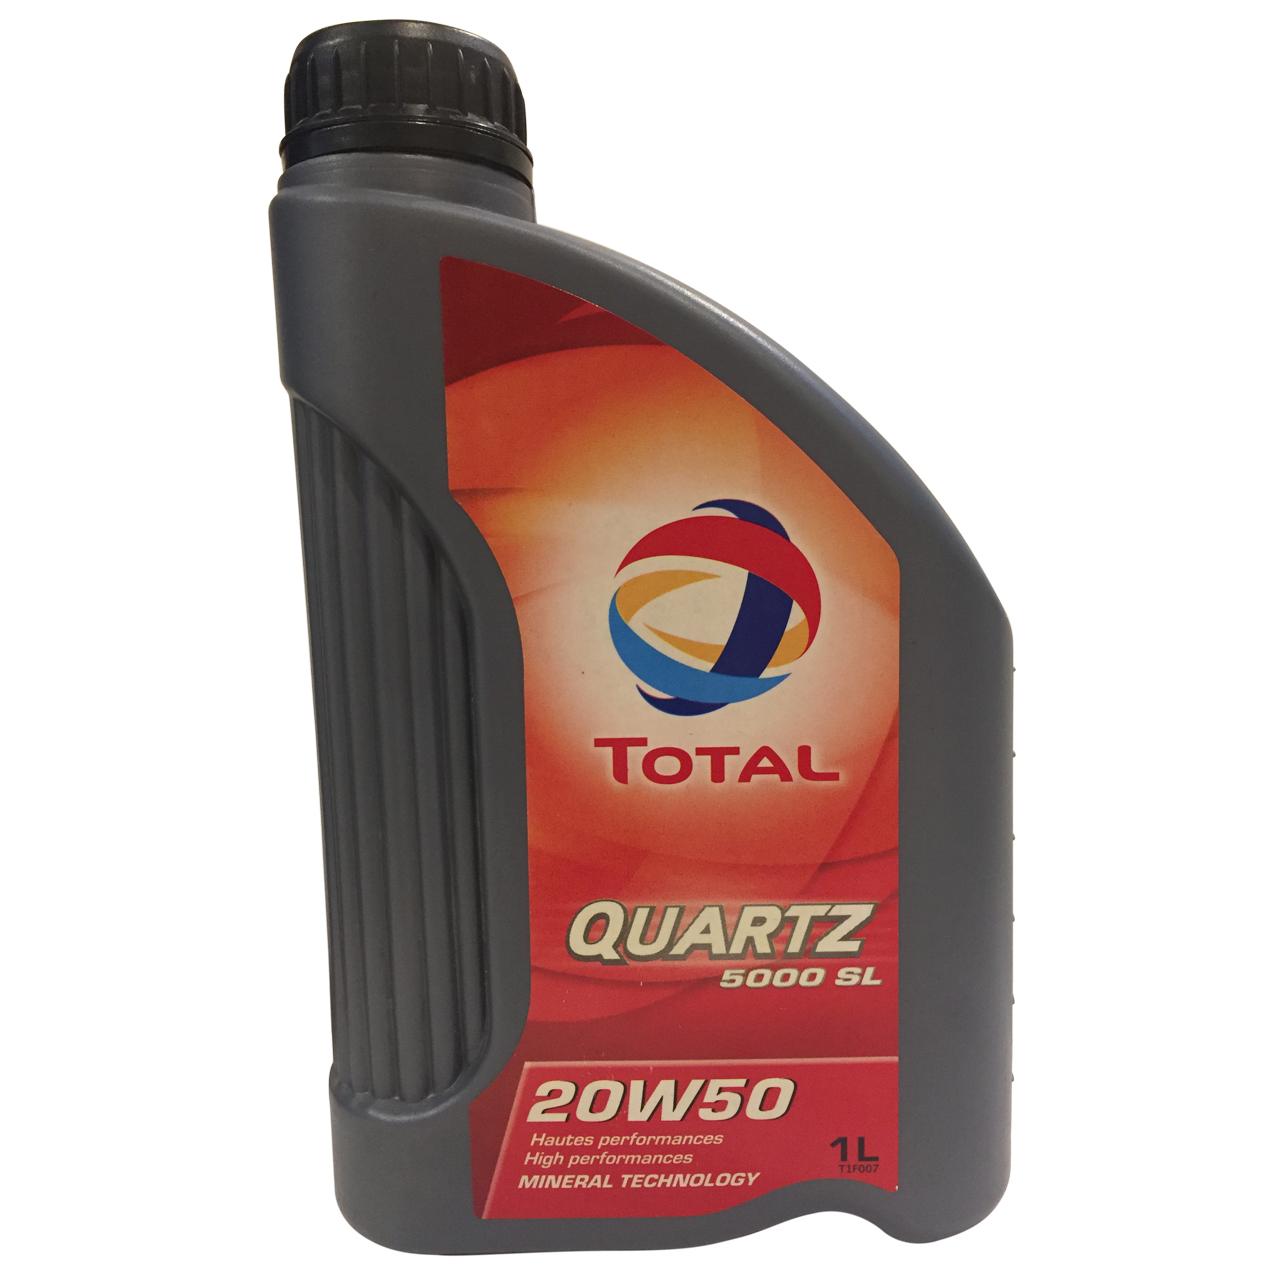 روغن موتور خودرو توتال مدل Quartz 5000 حجم 1 لیتر